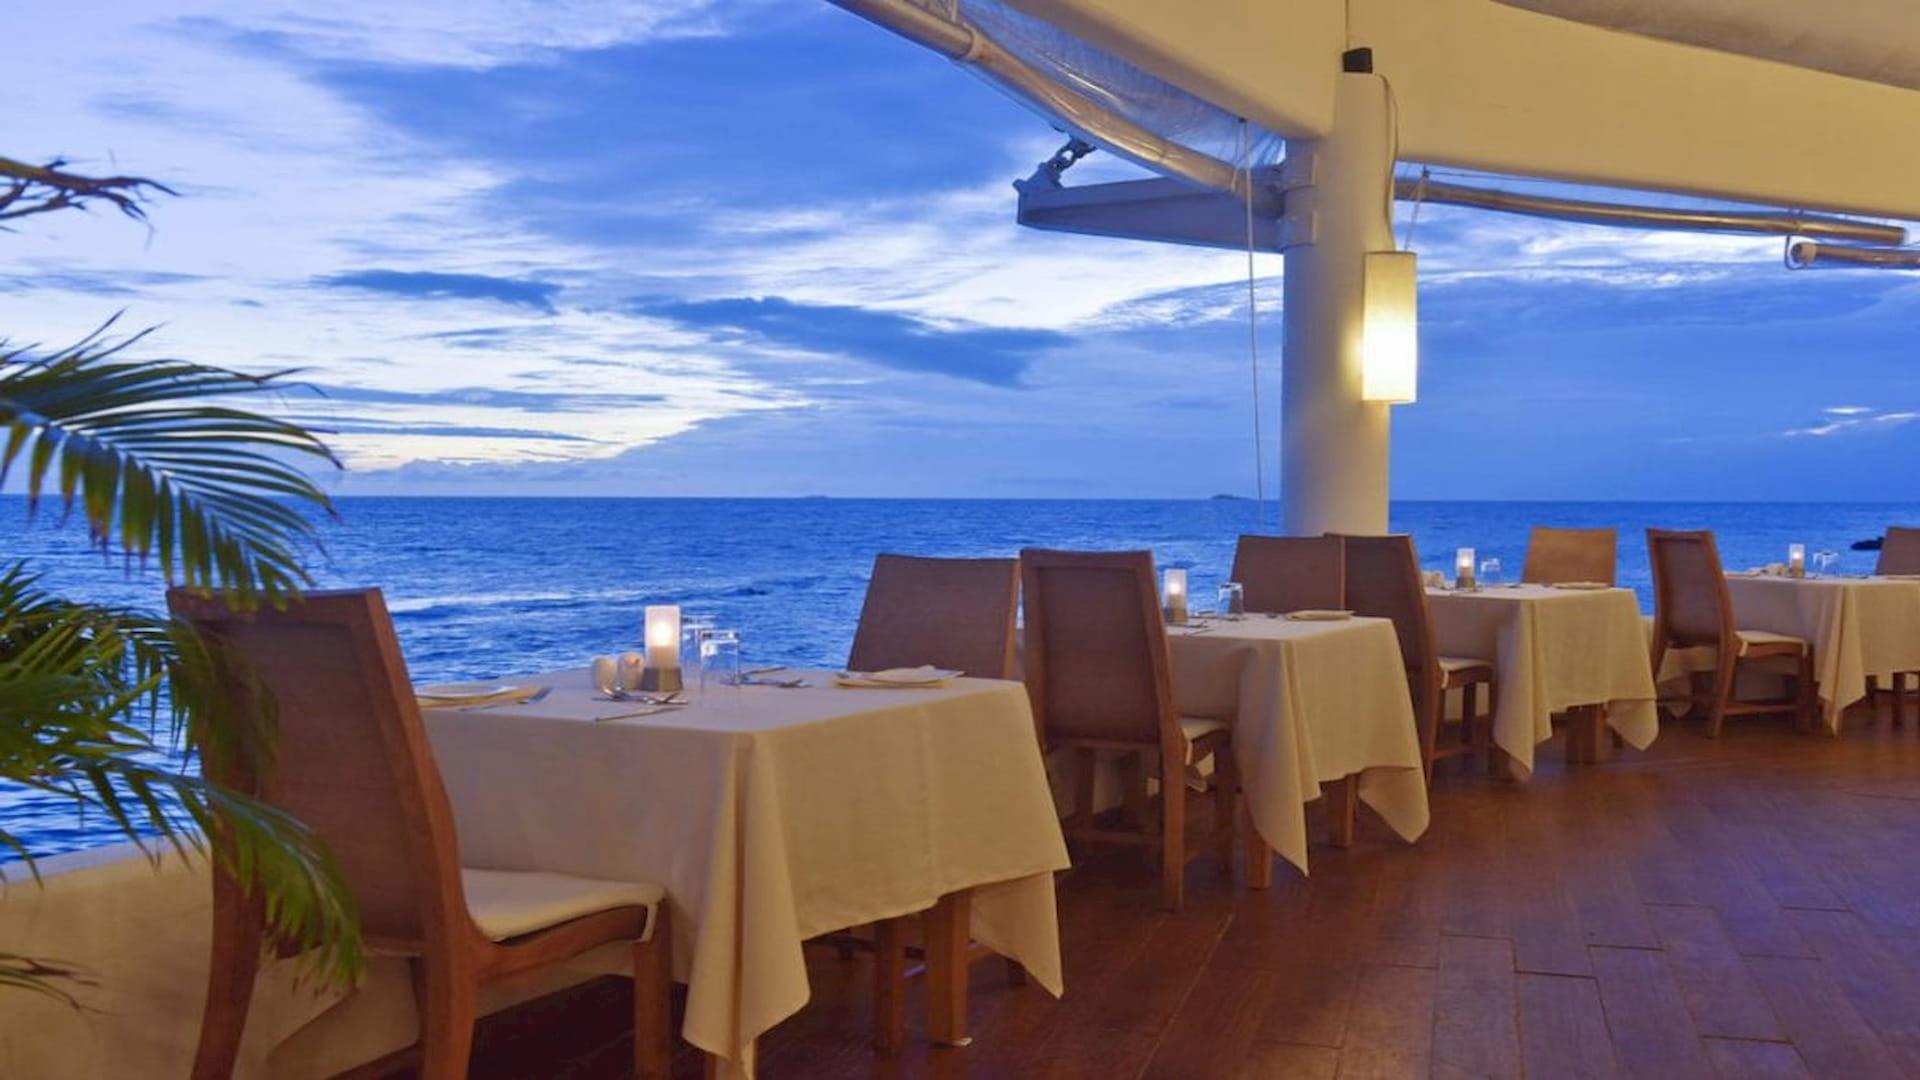 Resort Maldive Safari Island resort Main Restaurant